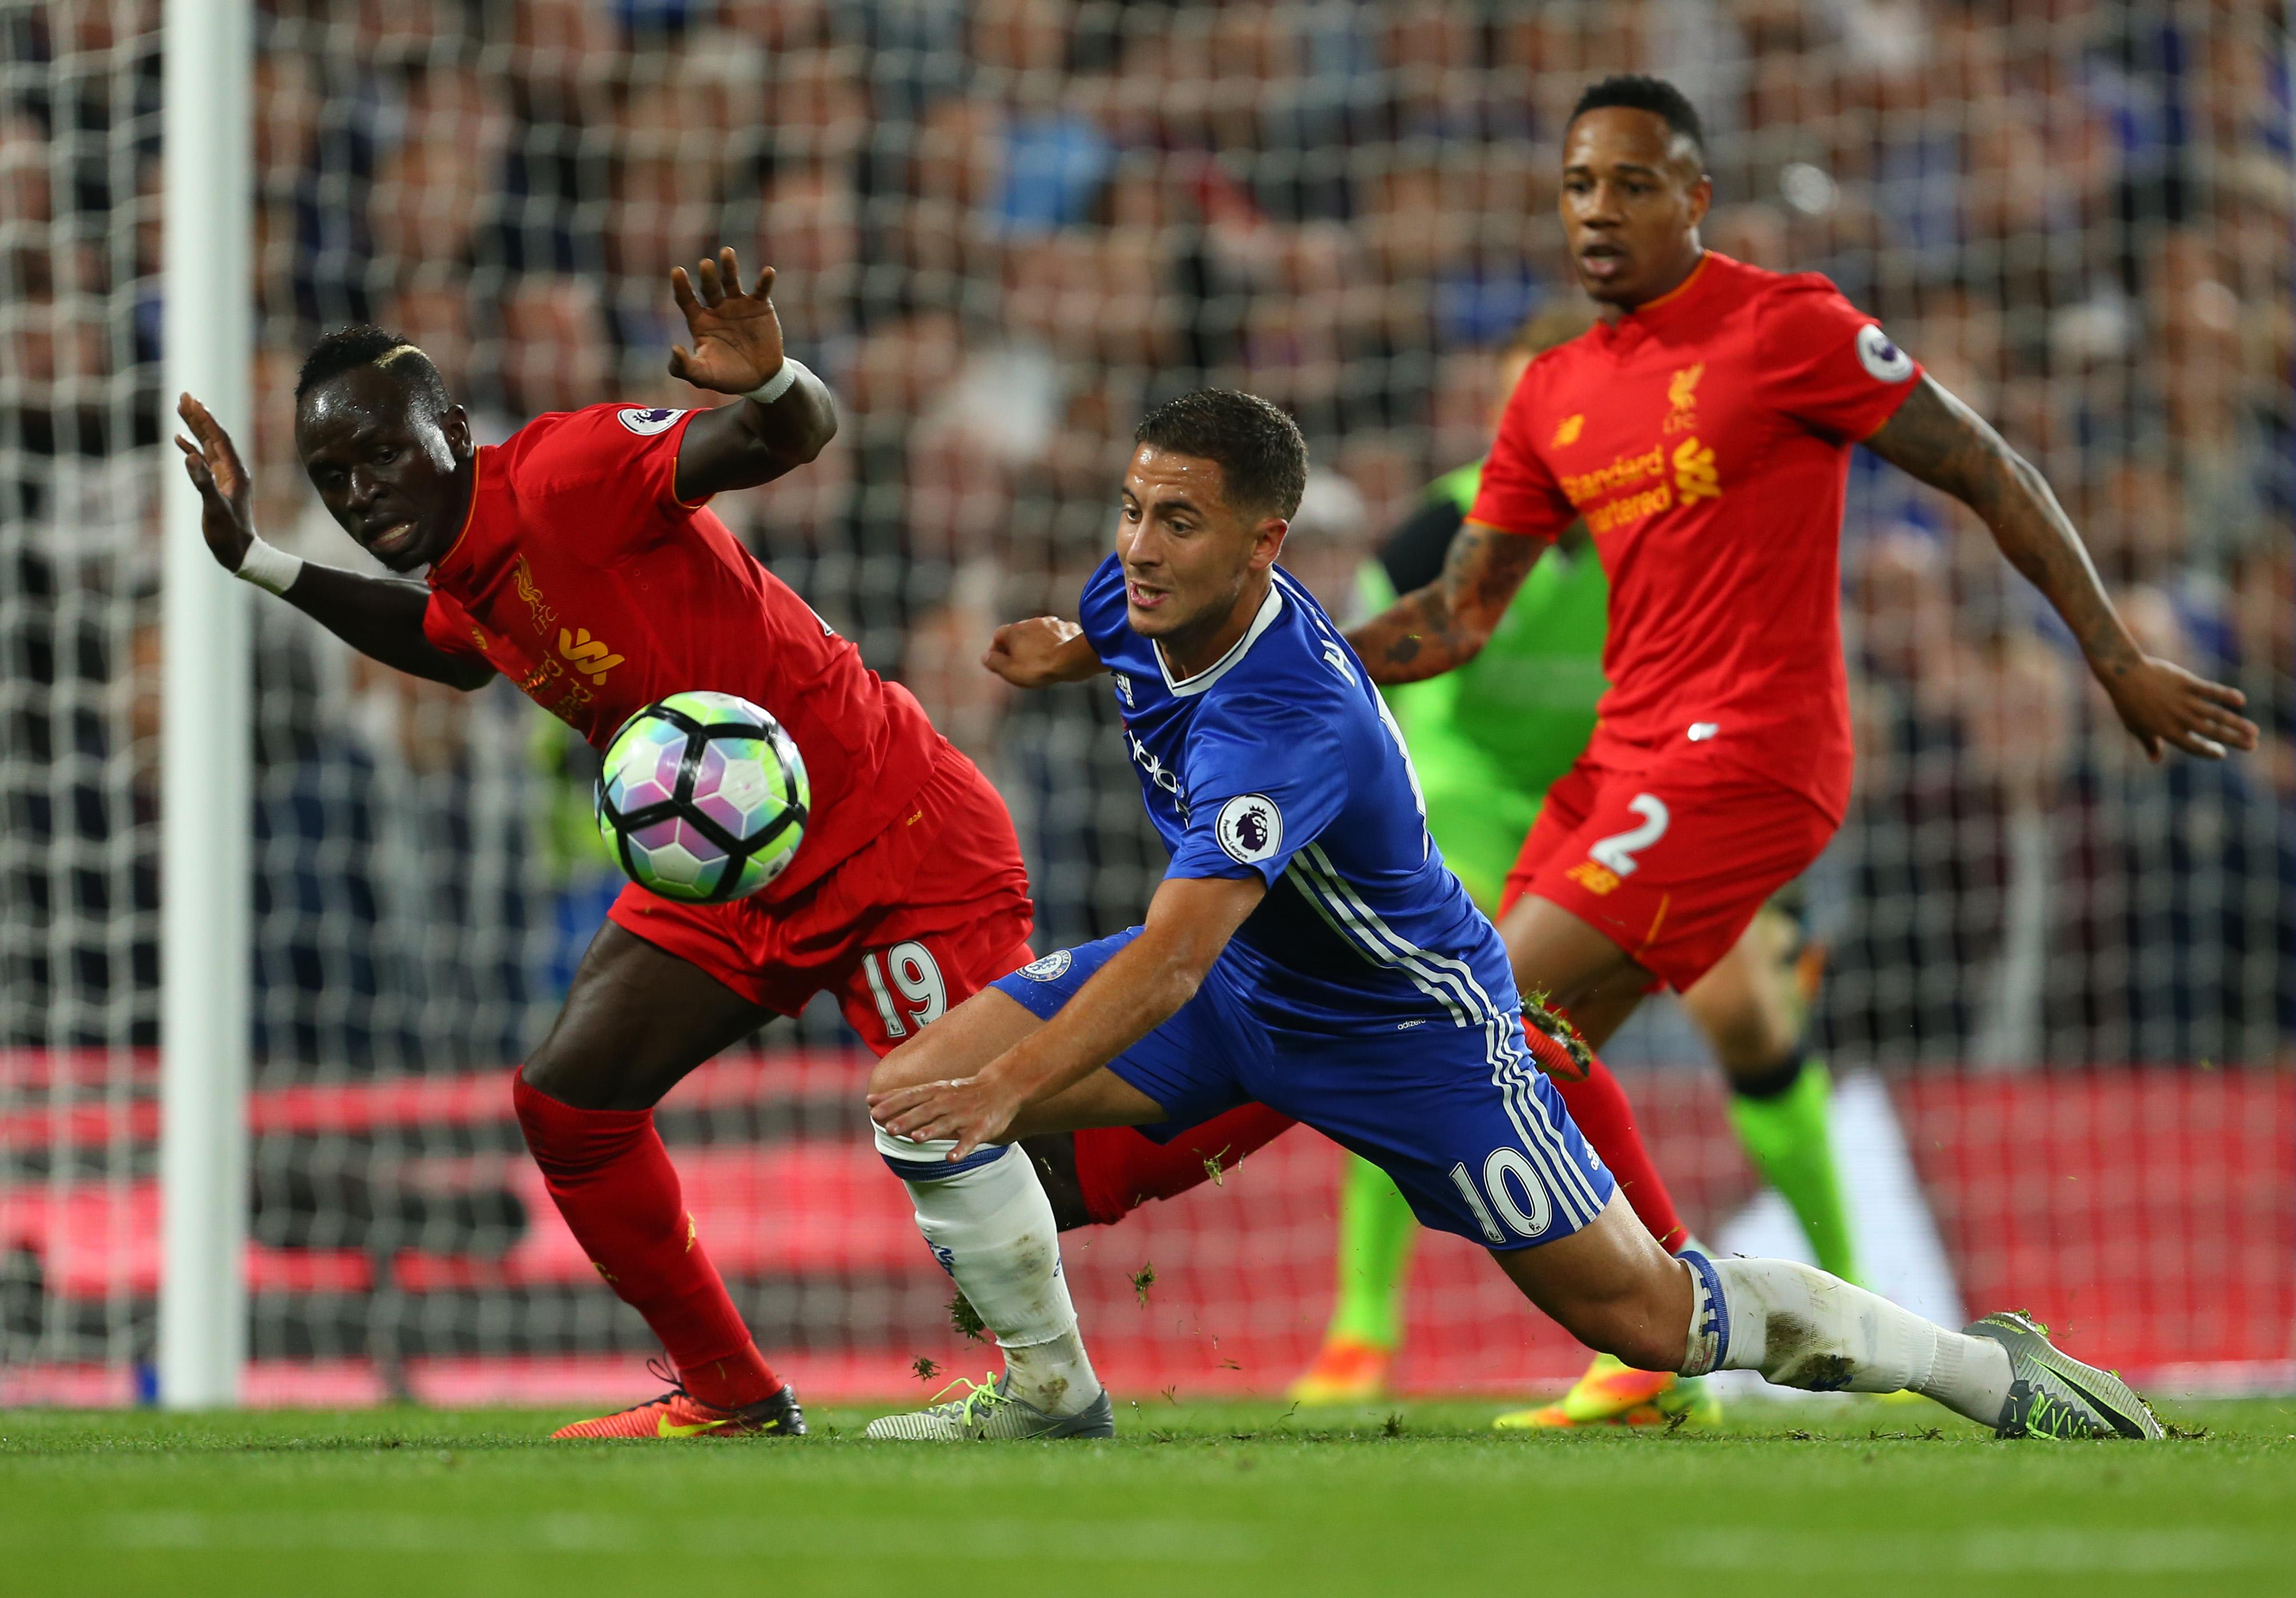 Premier league predictions week 7